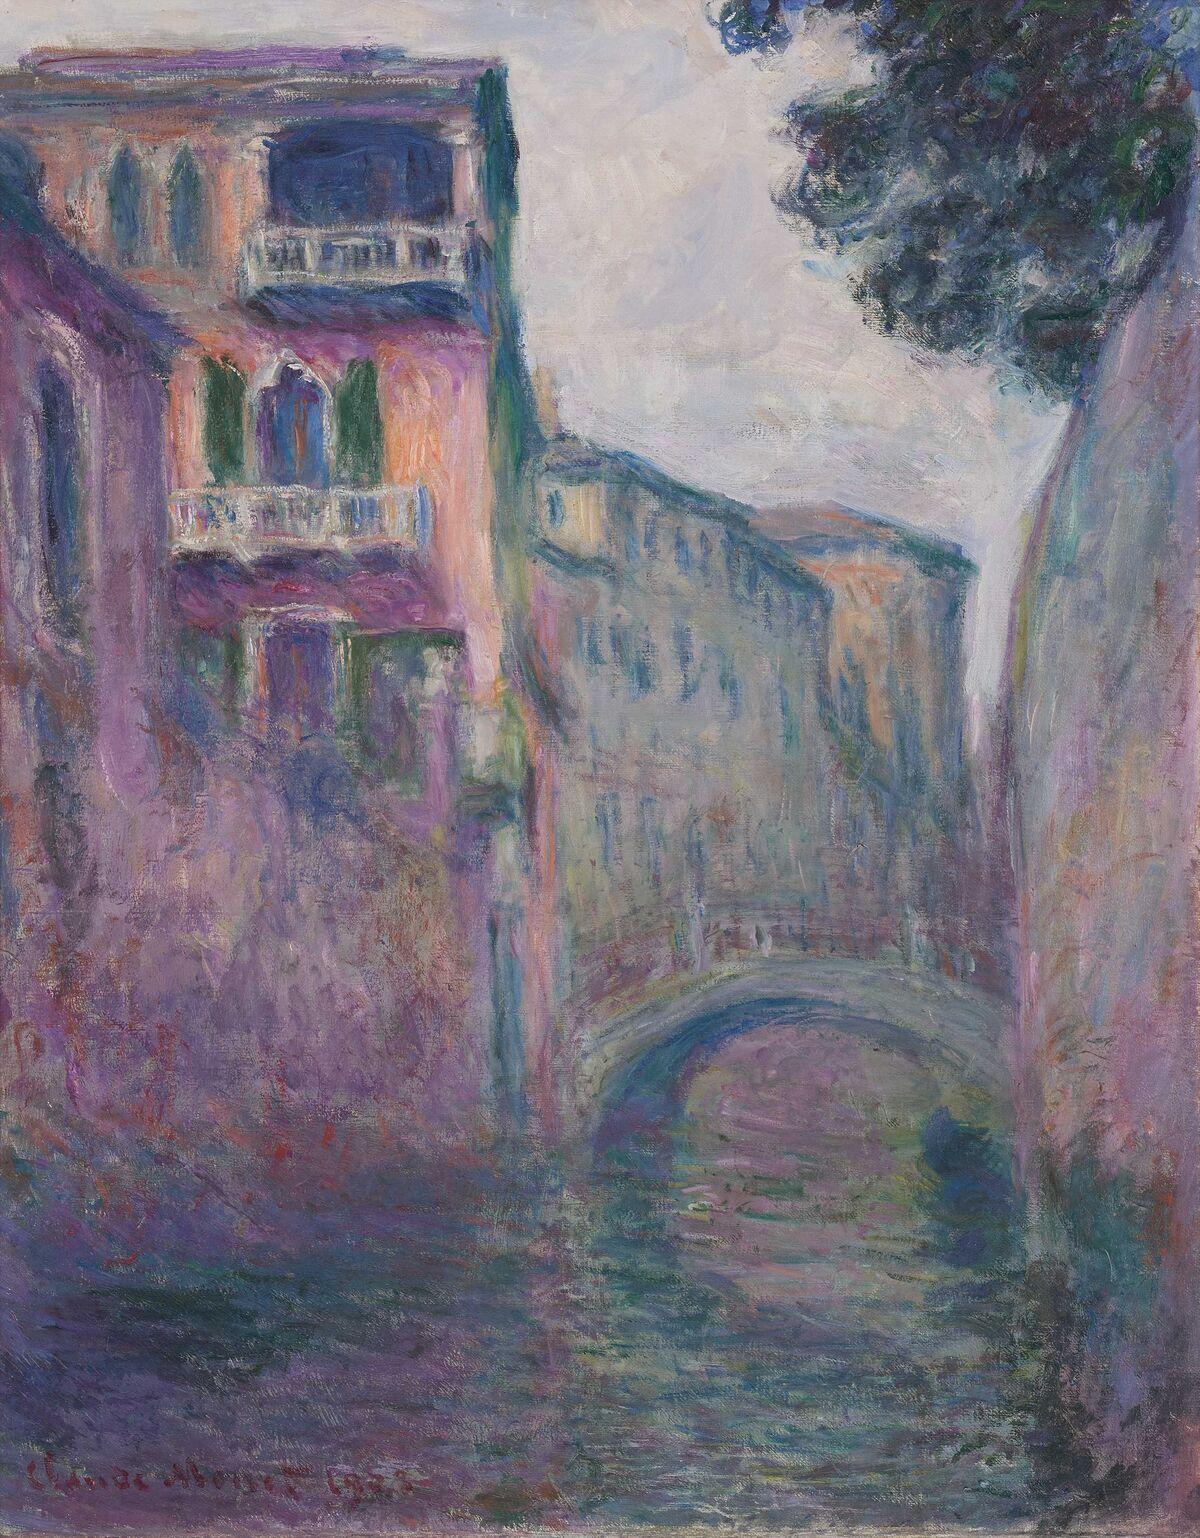 Claude Monet, Le Rio de la Salute, 1908. Courtesy of Lévy Gorvy.